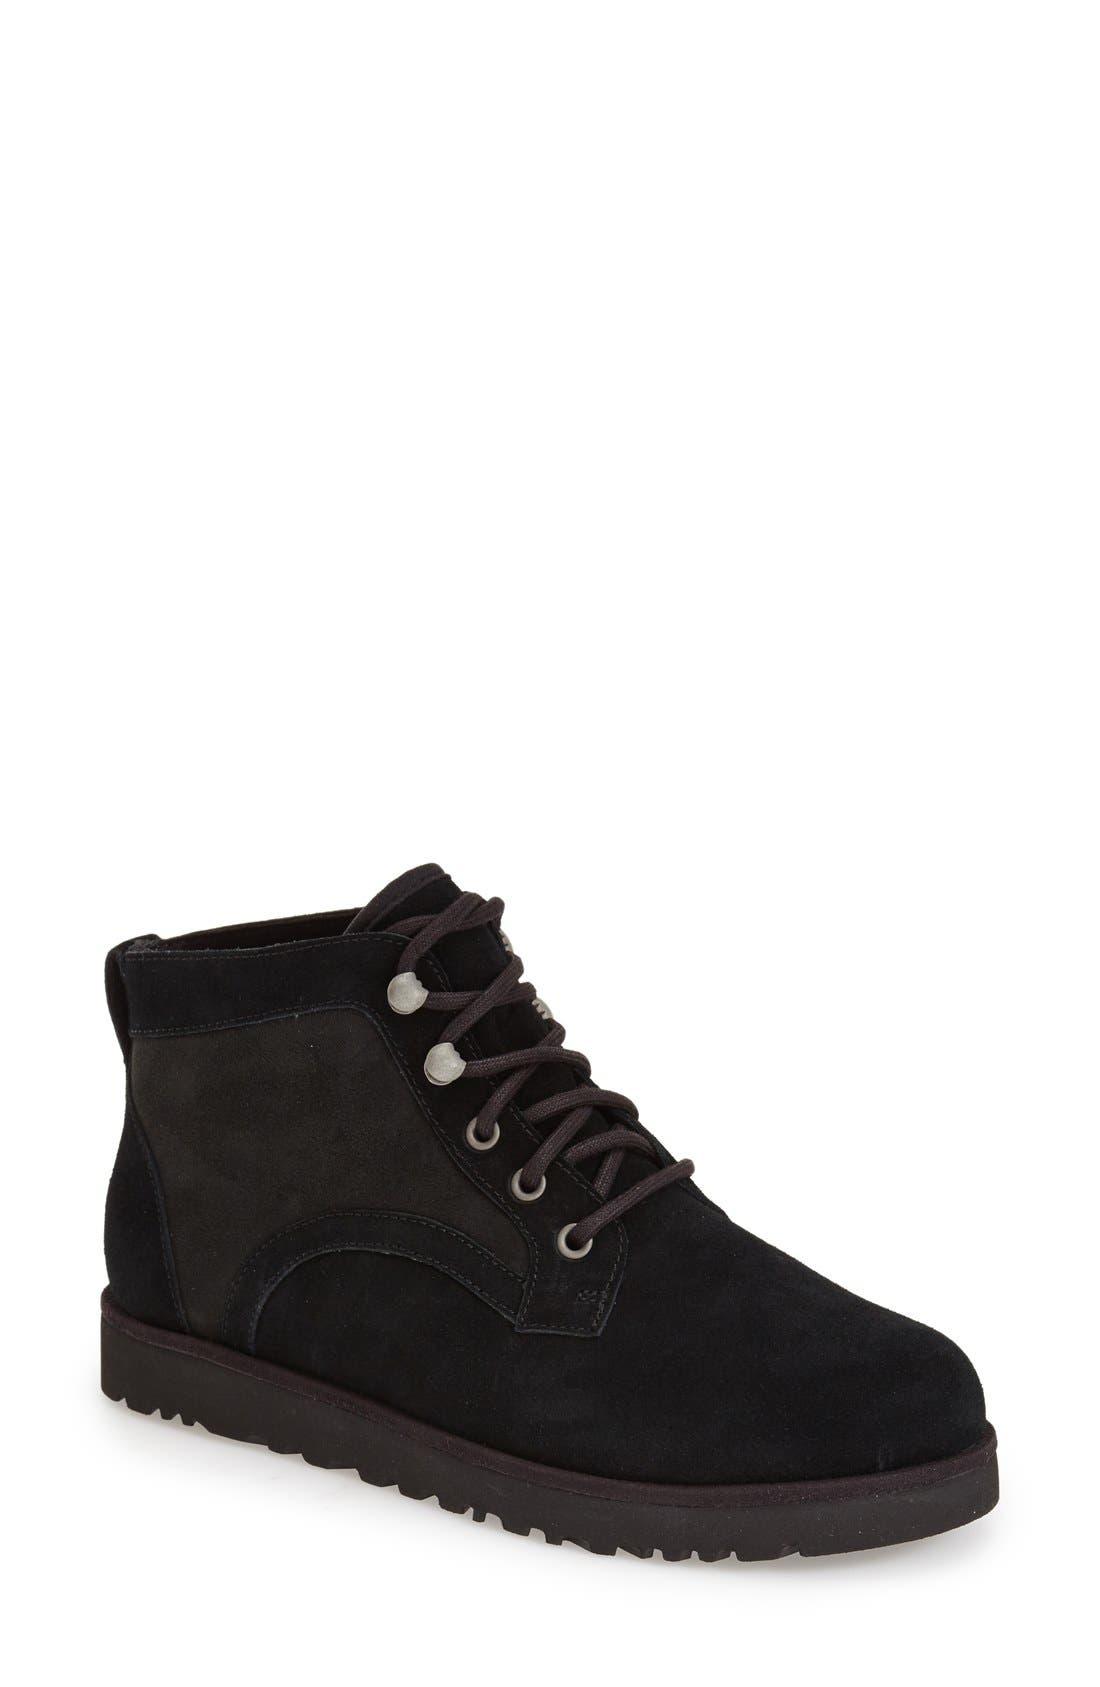 UGG® Bethany - Classic Slim™ Water Resistant Chukka Boot (Women)